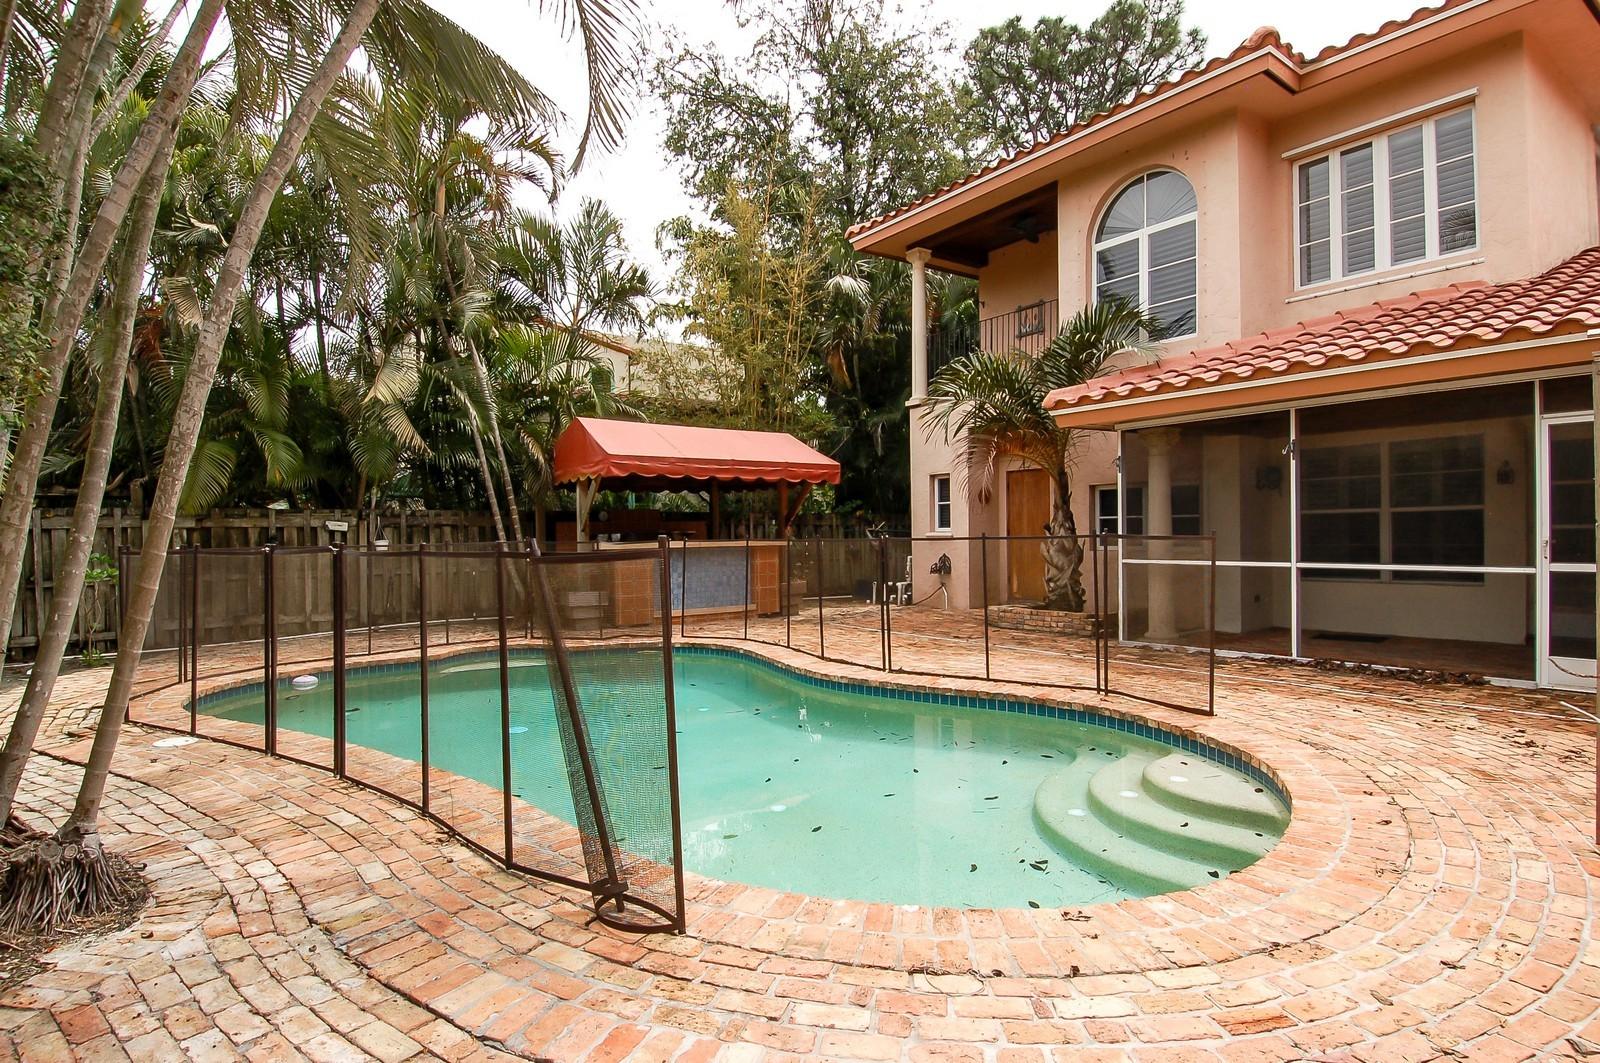 Real Estate Photography - 899 Azalea St, Boca Raton, FL, 33486 - Pool